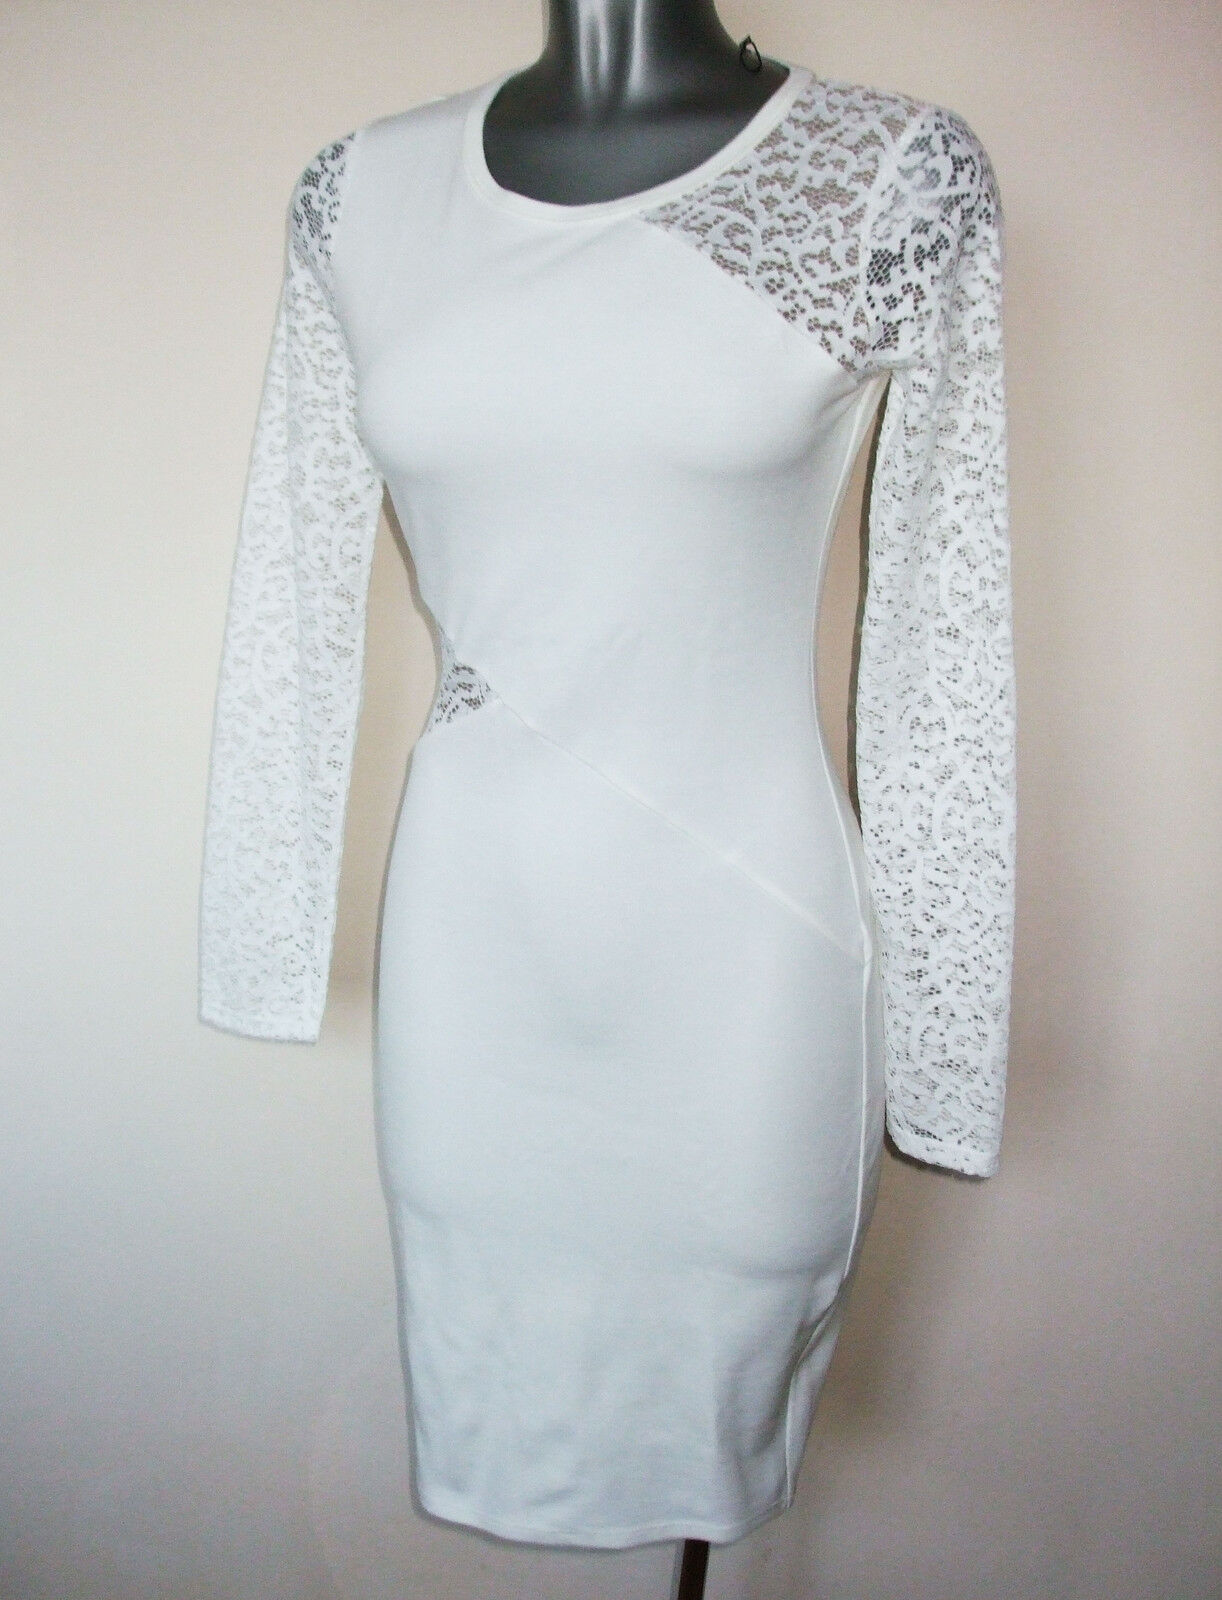 BCBG MAXAZRIA JORDEN DRESS, SIZE XS, USA 4, RRP  New without tags